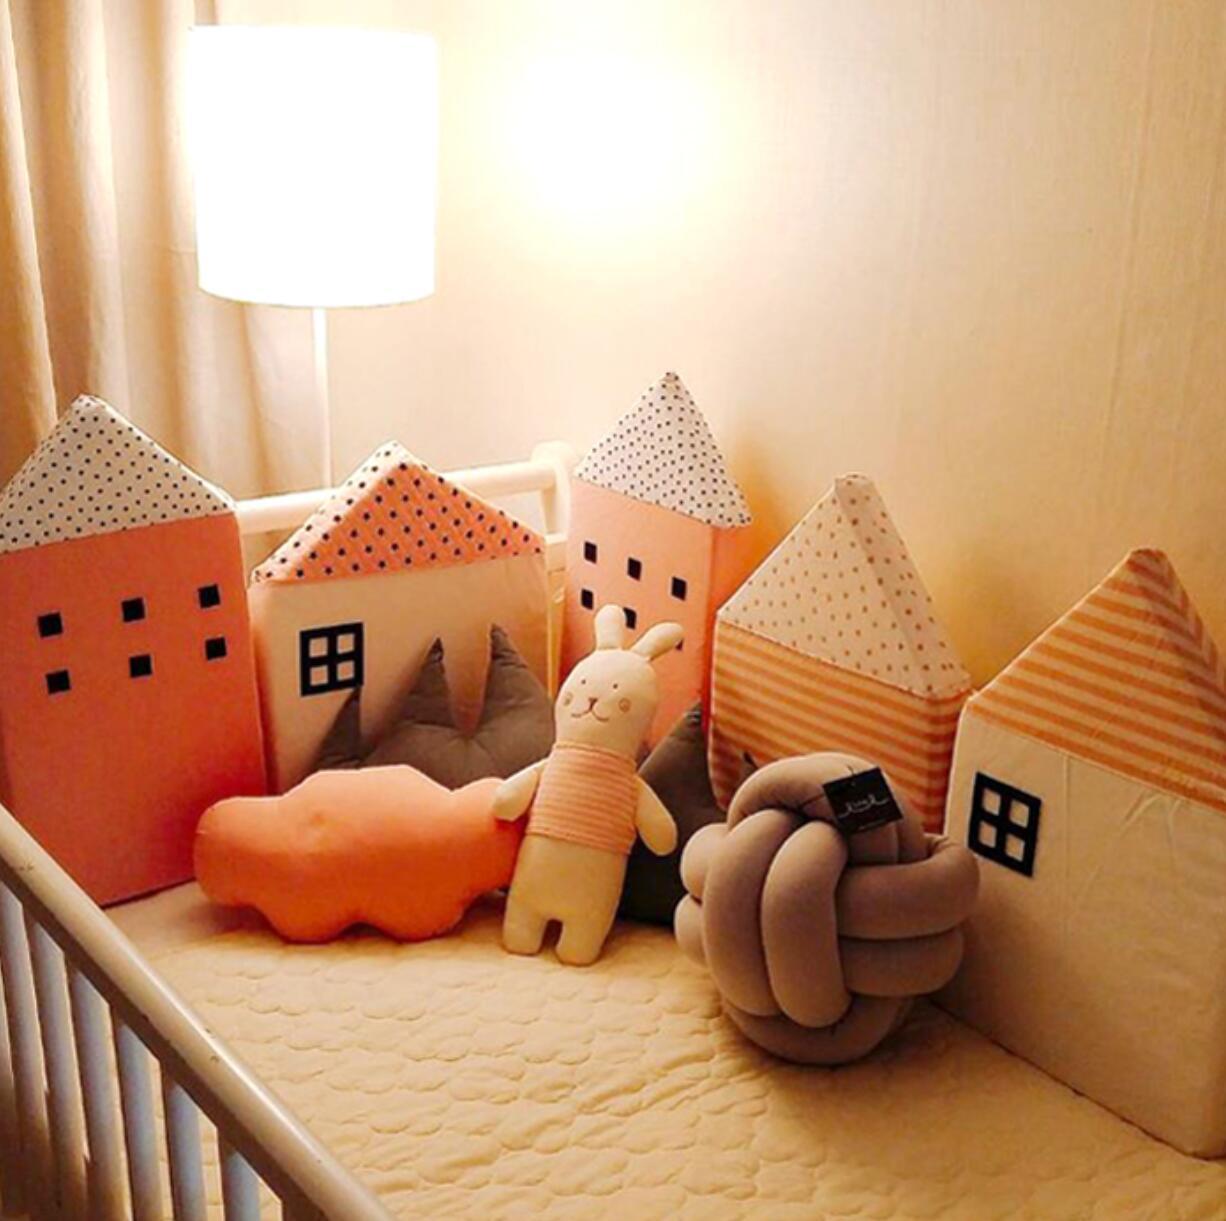 4pcs Baby Bed Bumper Nordic Style House Shape Design ...